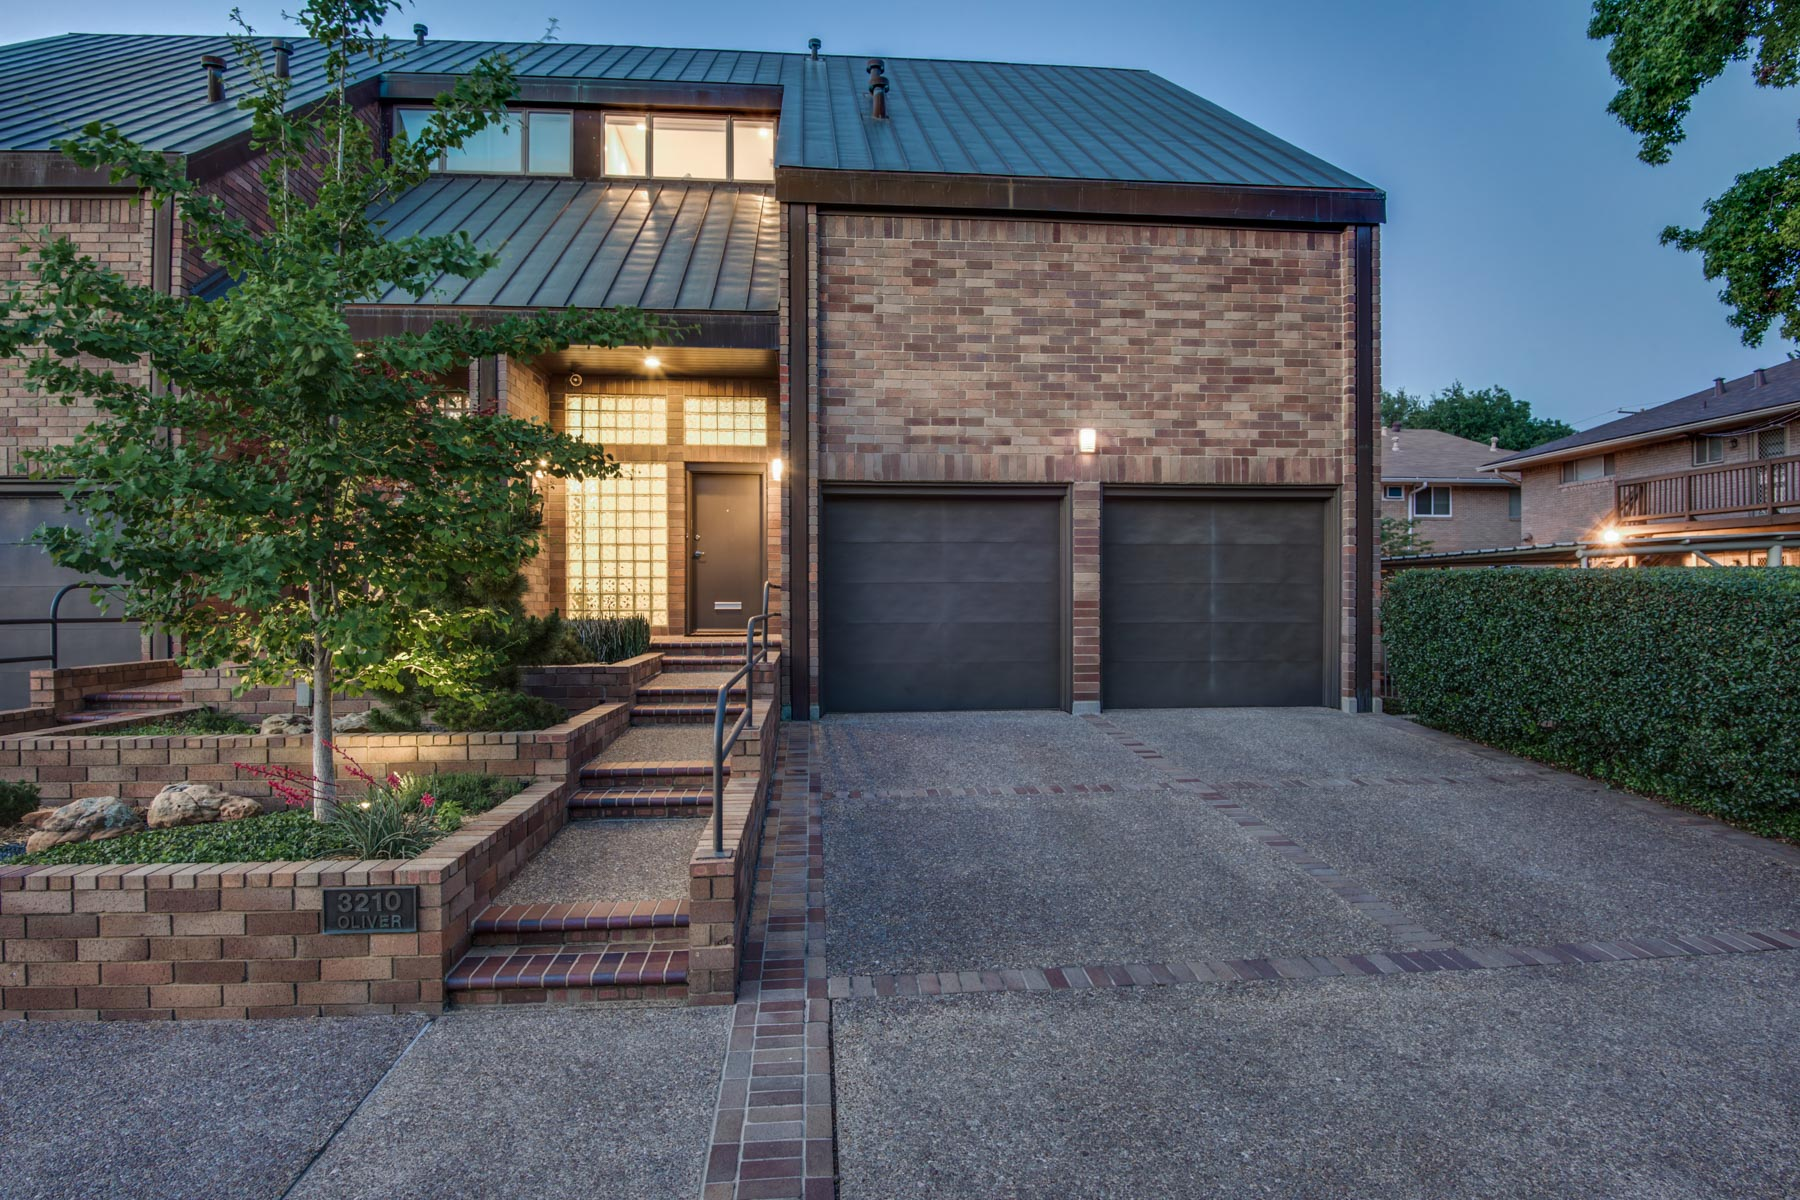 联栋屋 为 销售 在 Low Maintenance Duplex in Prime Location 3210 Oliver Ave 达拉斯, 得克萨斯州, 75205 美国